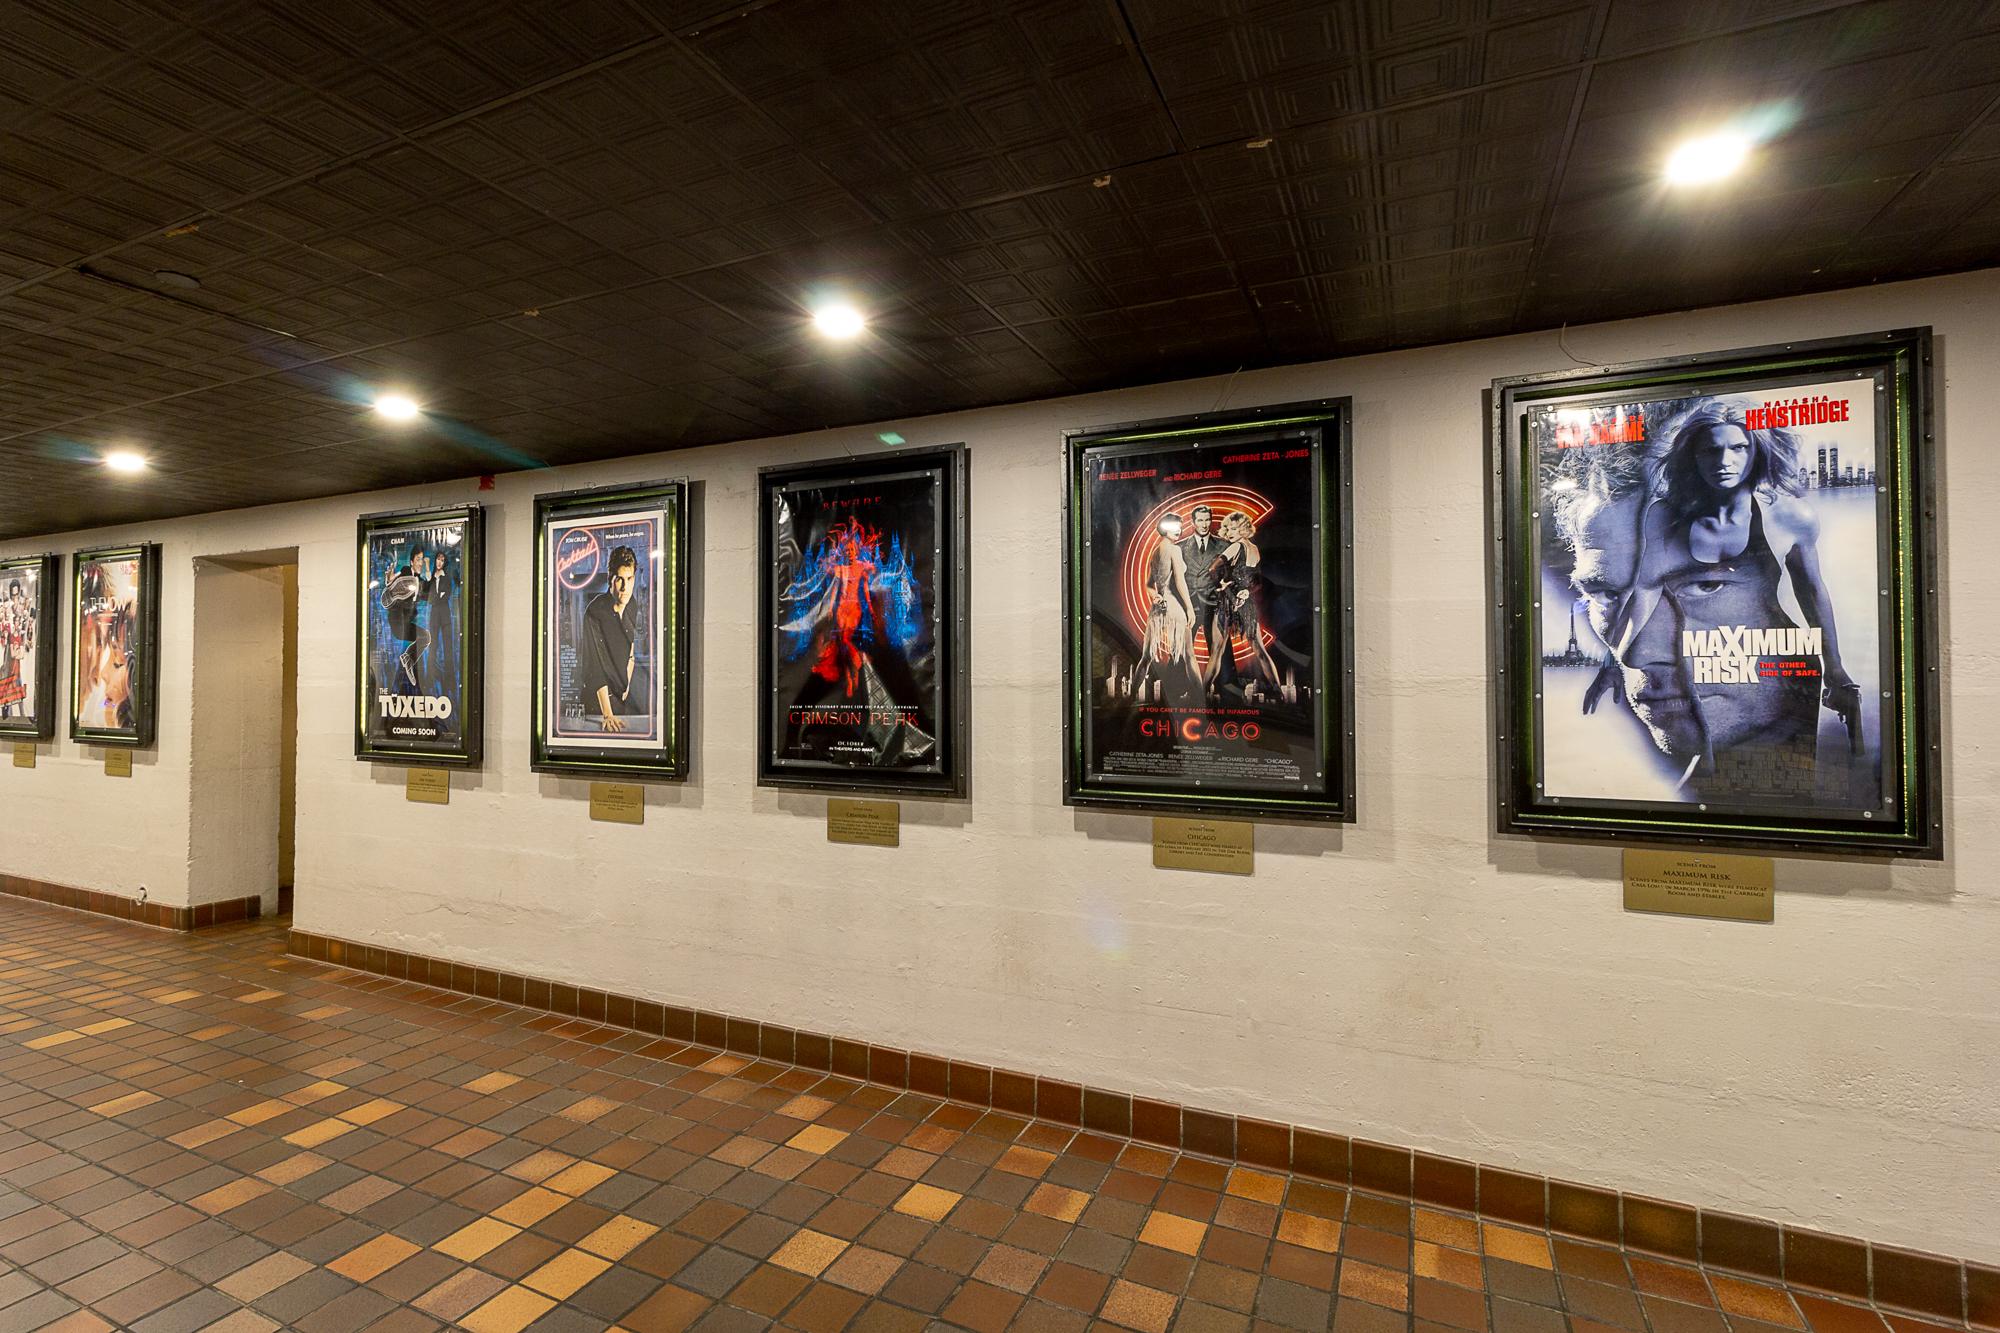 Hollywood Film Gallery